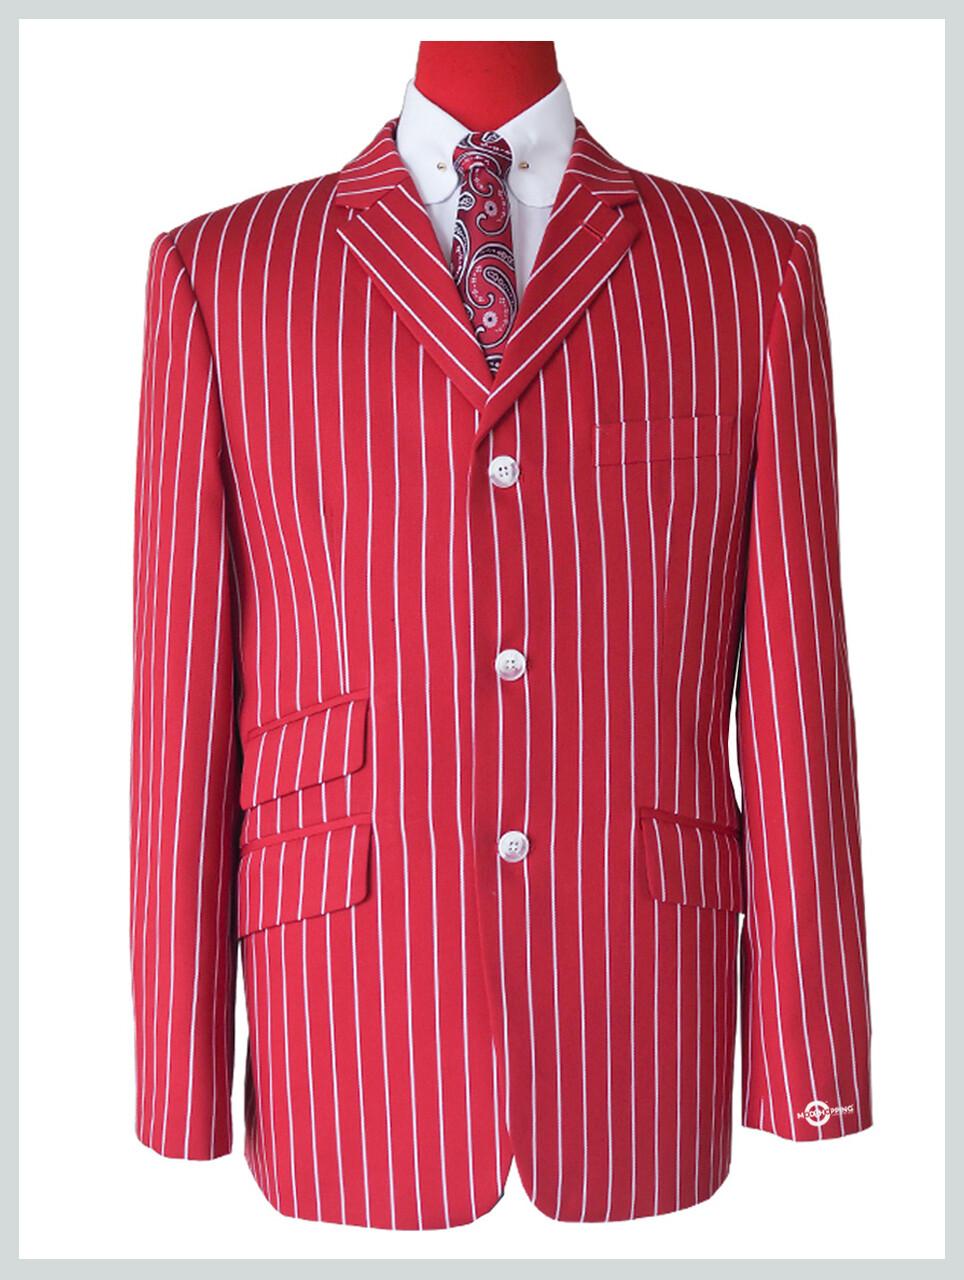 60s Vintage Style Red Striped Blazer